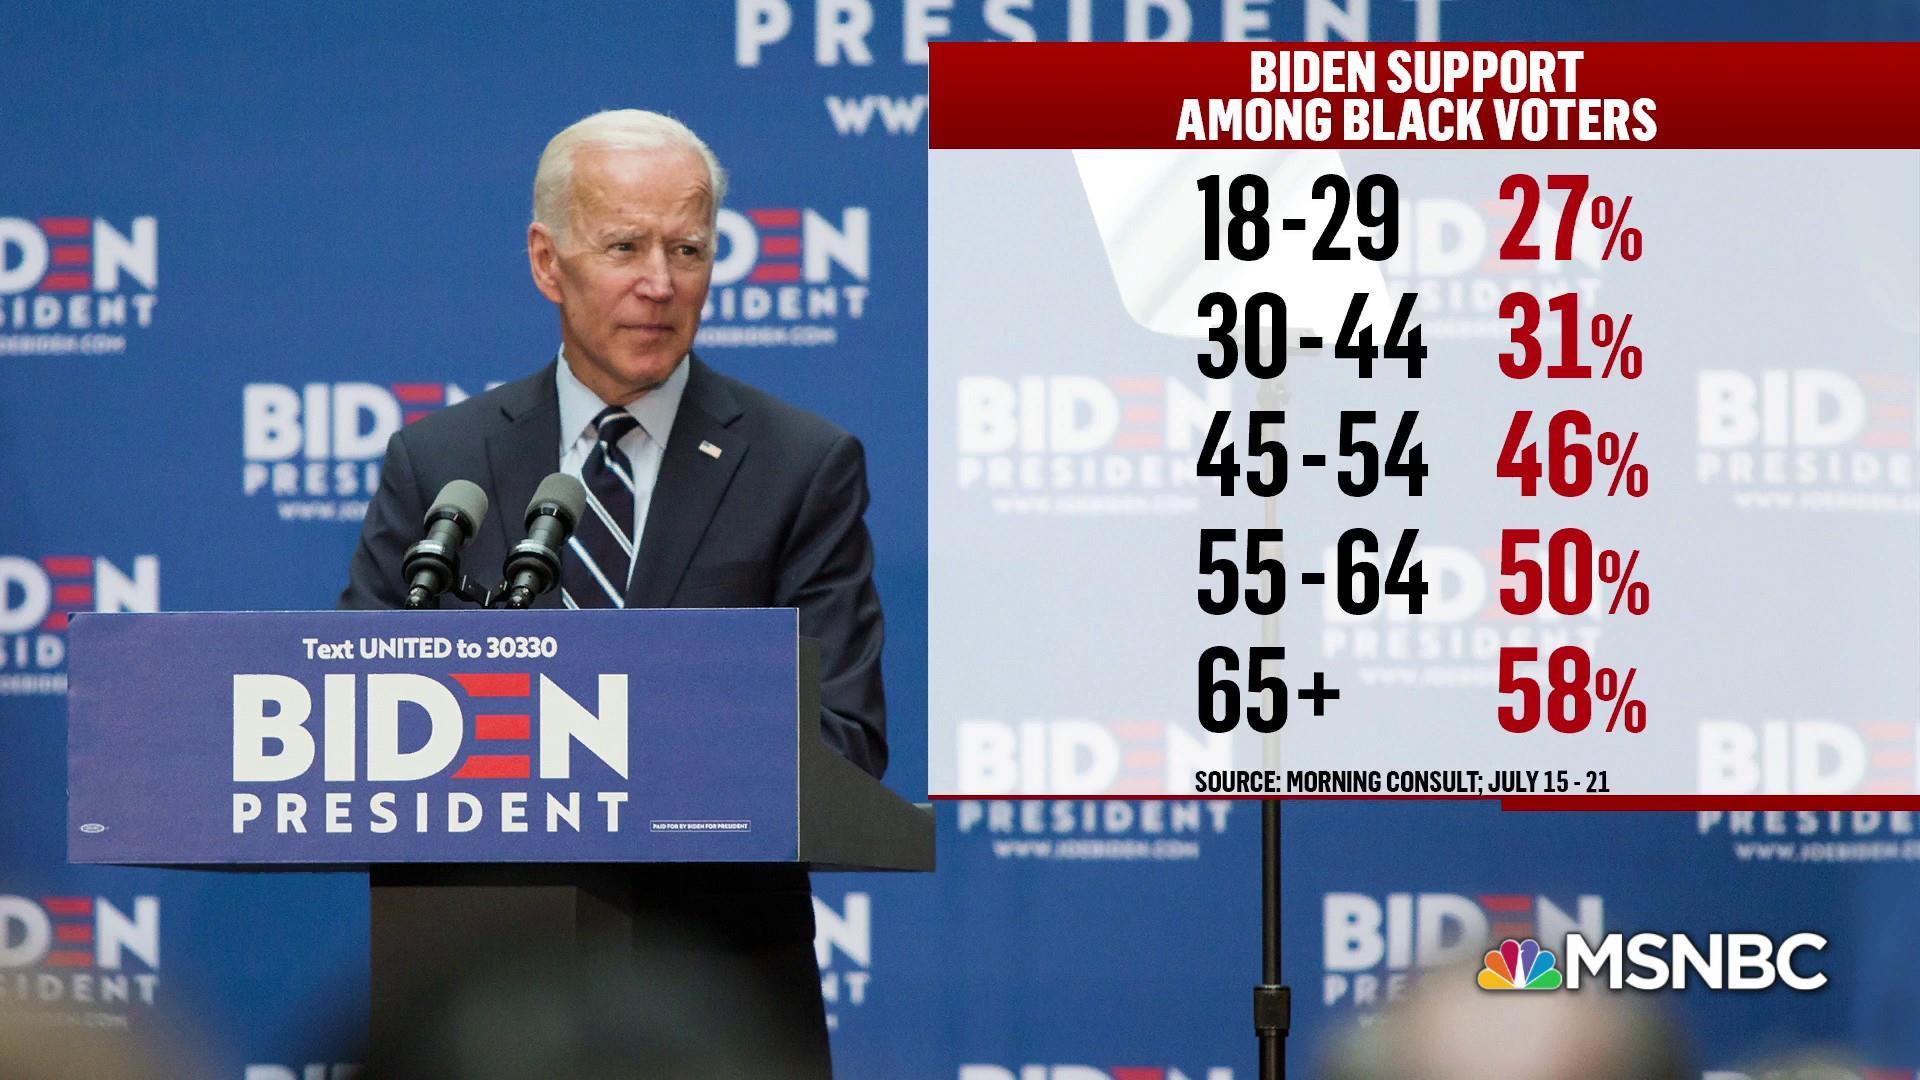 Black voters: A central part of Democratic primary politics